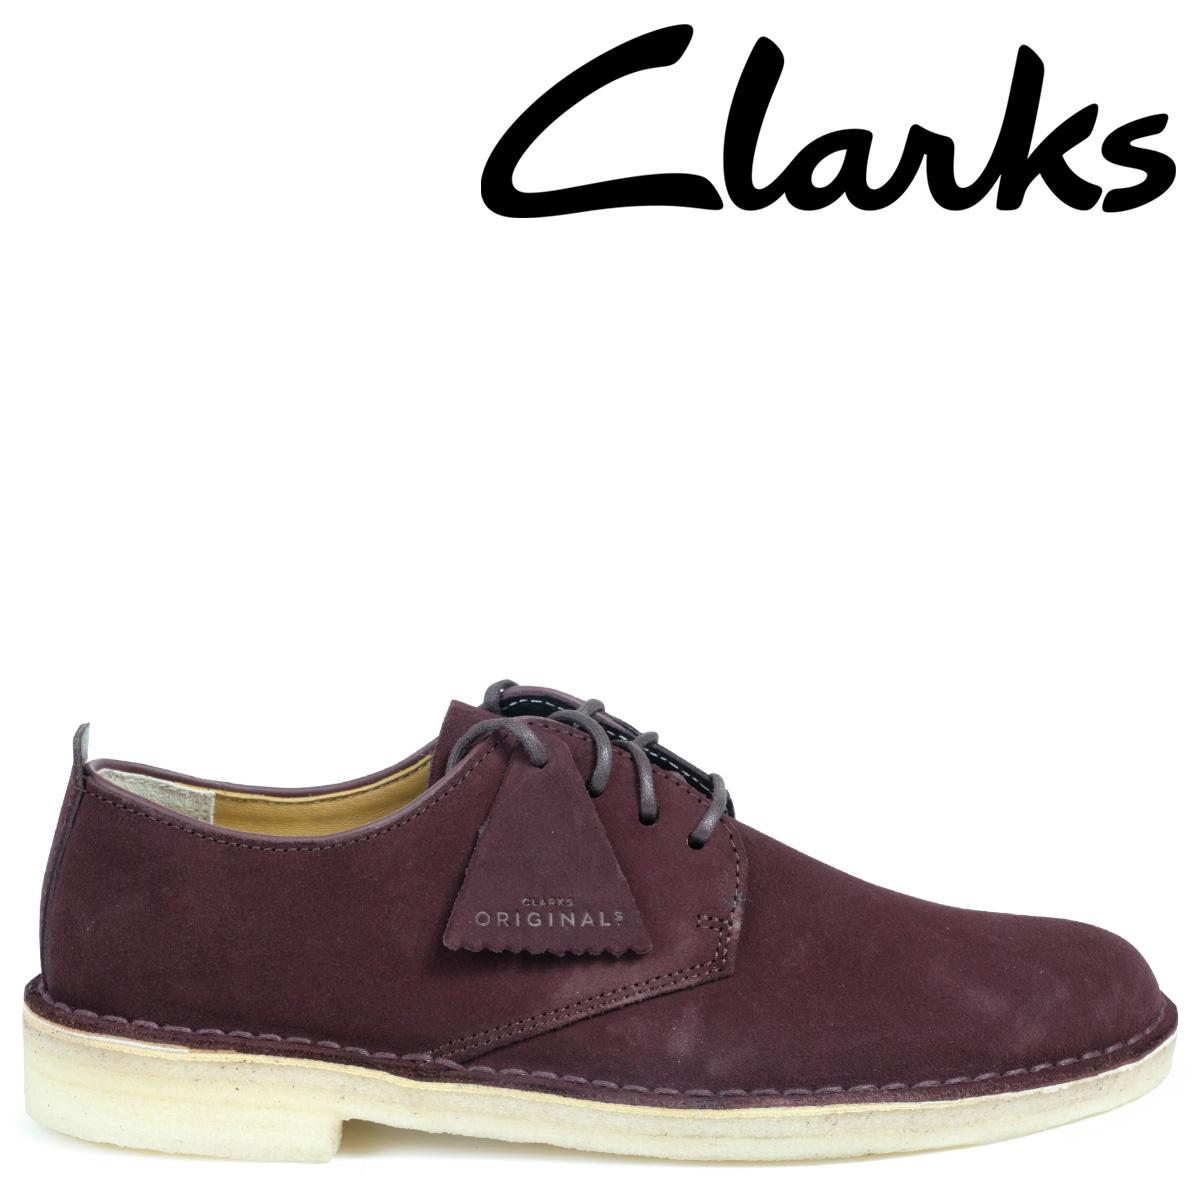 Clarks デザート ロンドン シューズ クラークス メンズ DESERT LONDON 2628511 靴 バーガンディー